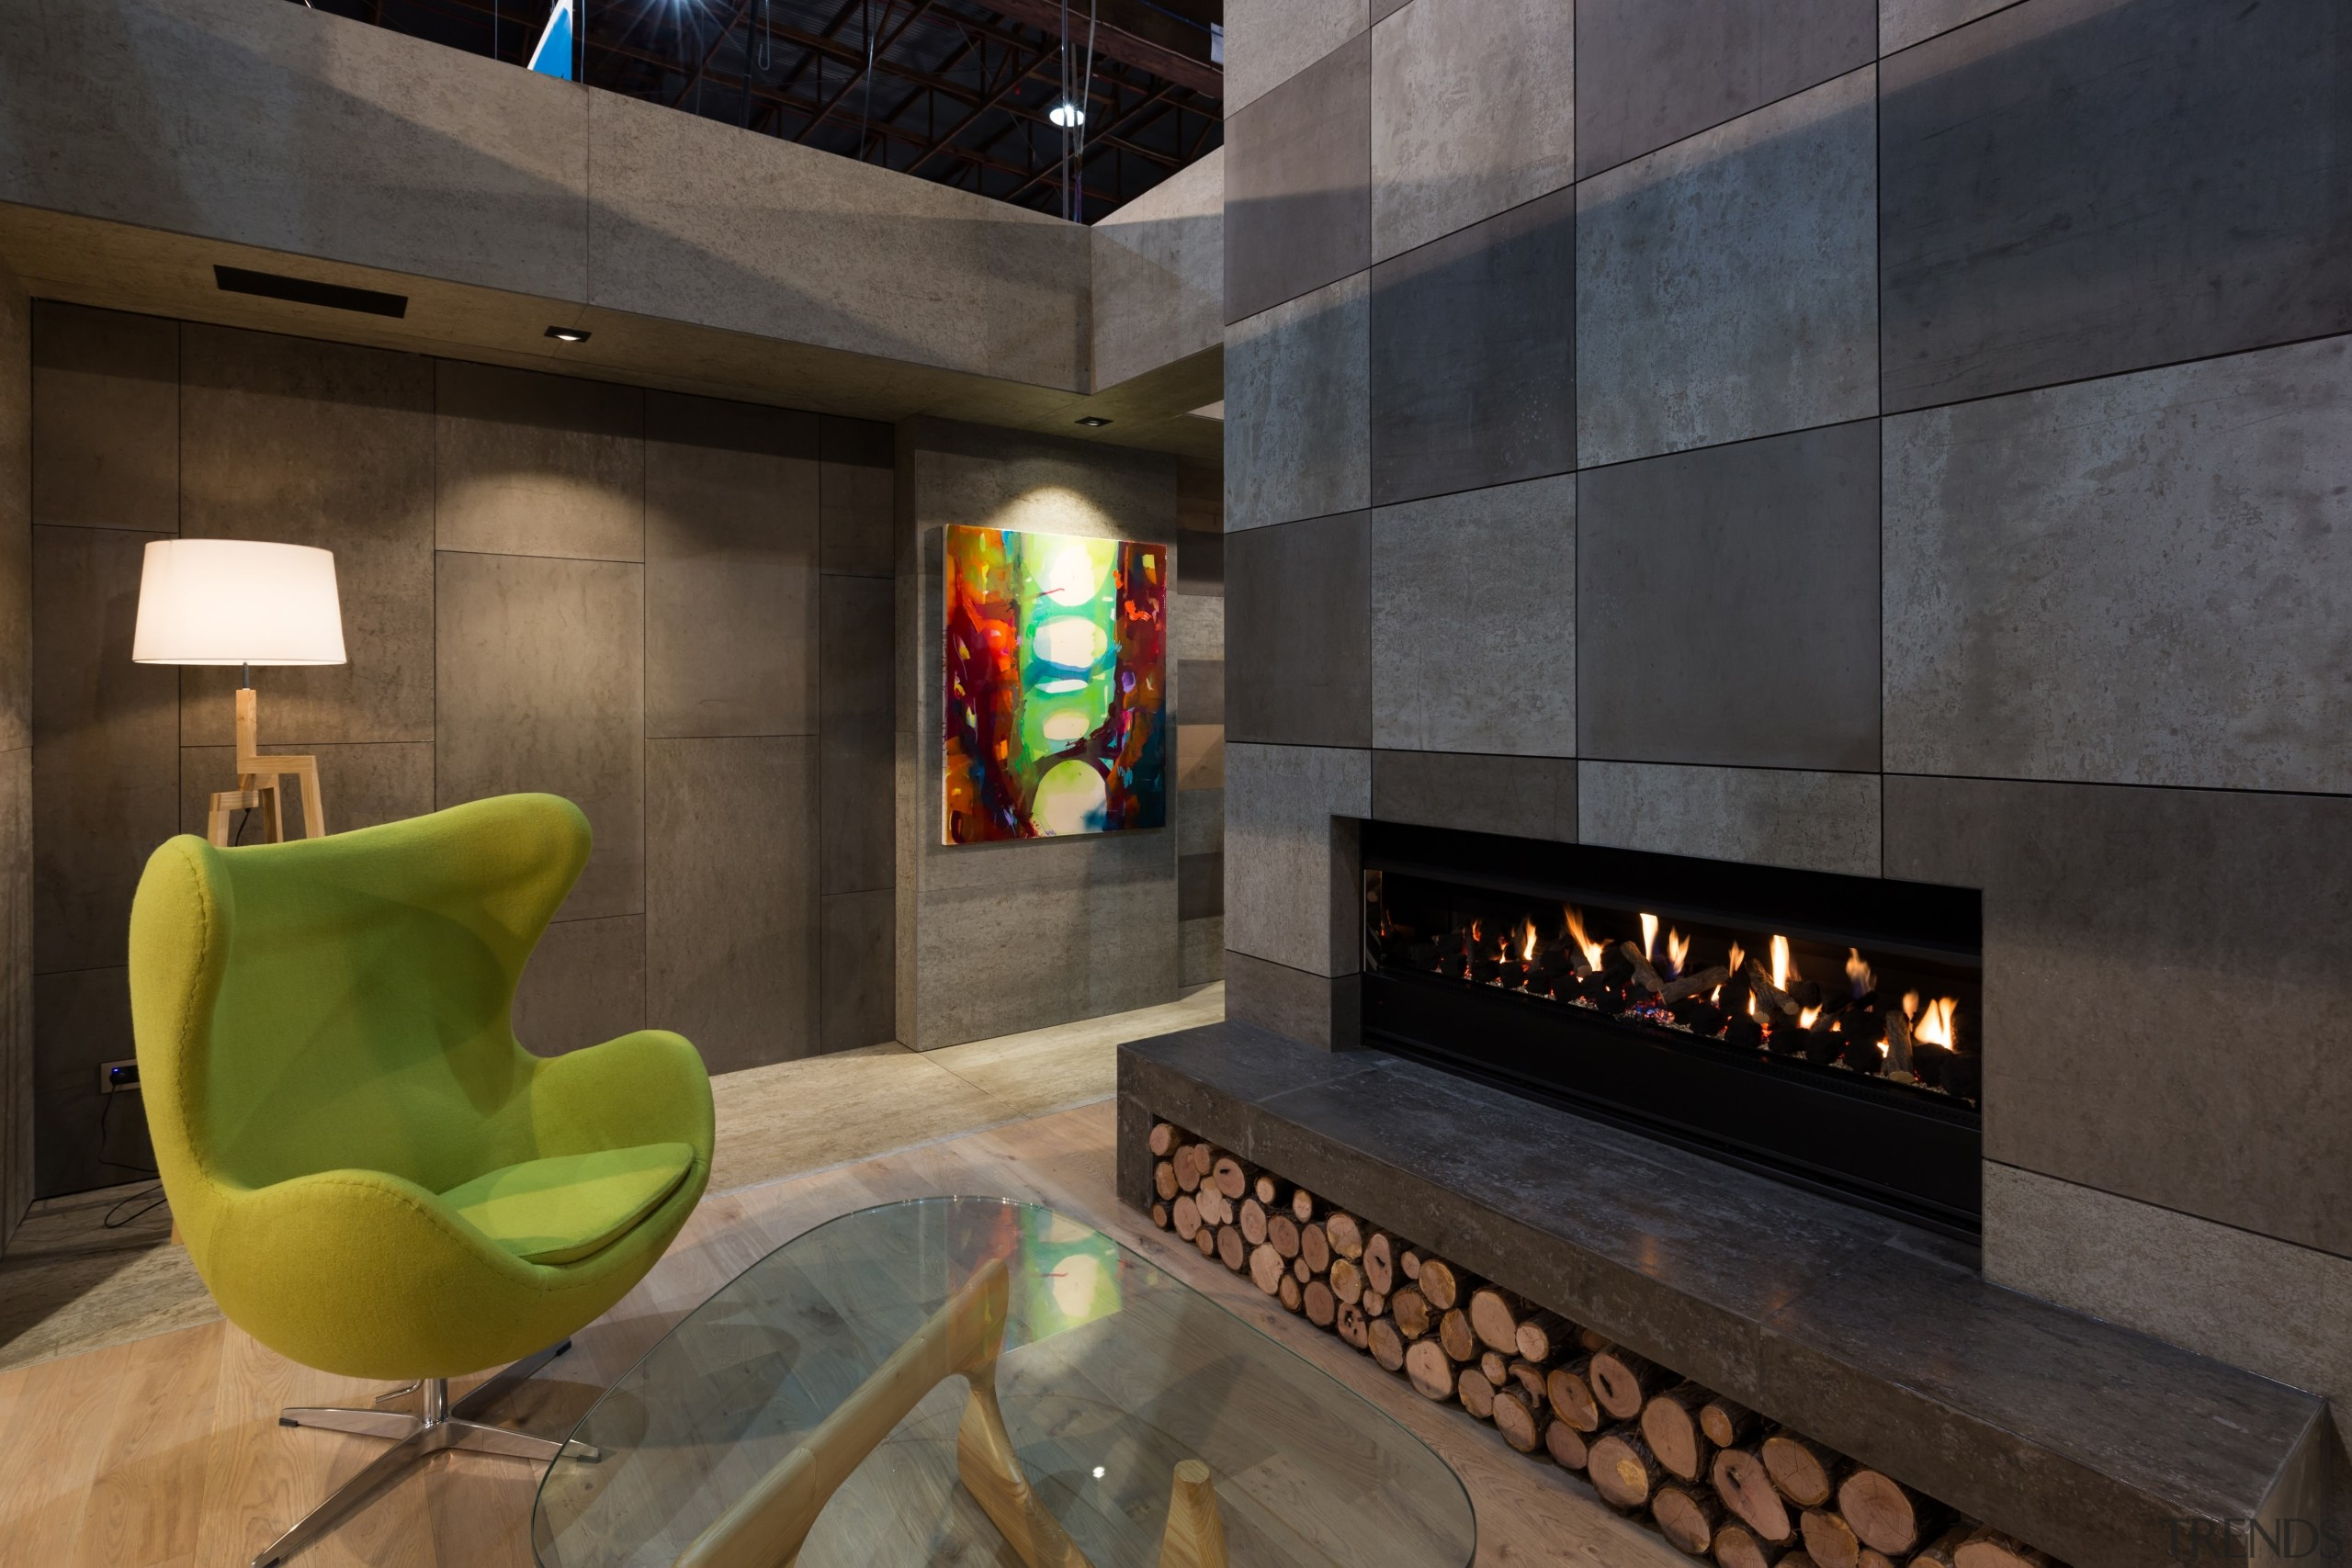 IMG_6180 - fireplace | hearth | interior design fireplace, hearth, interior design, living room, lobby, black